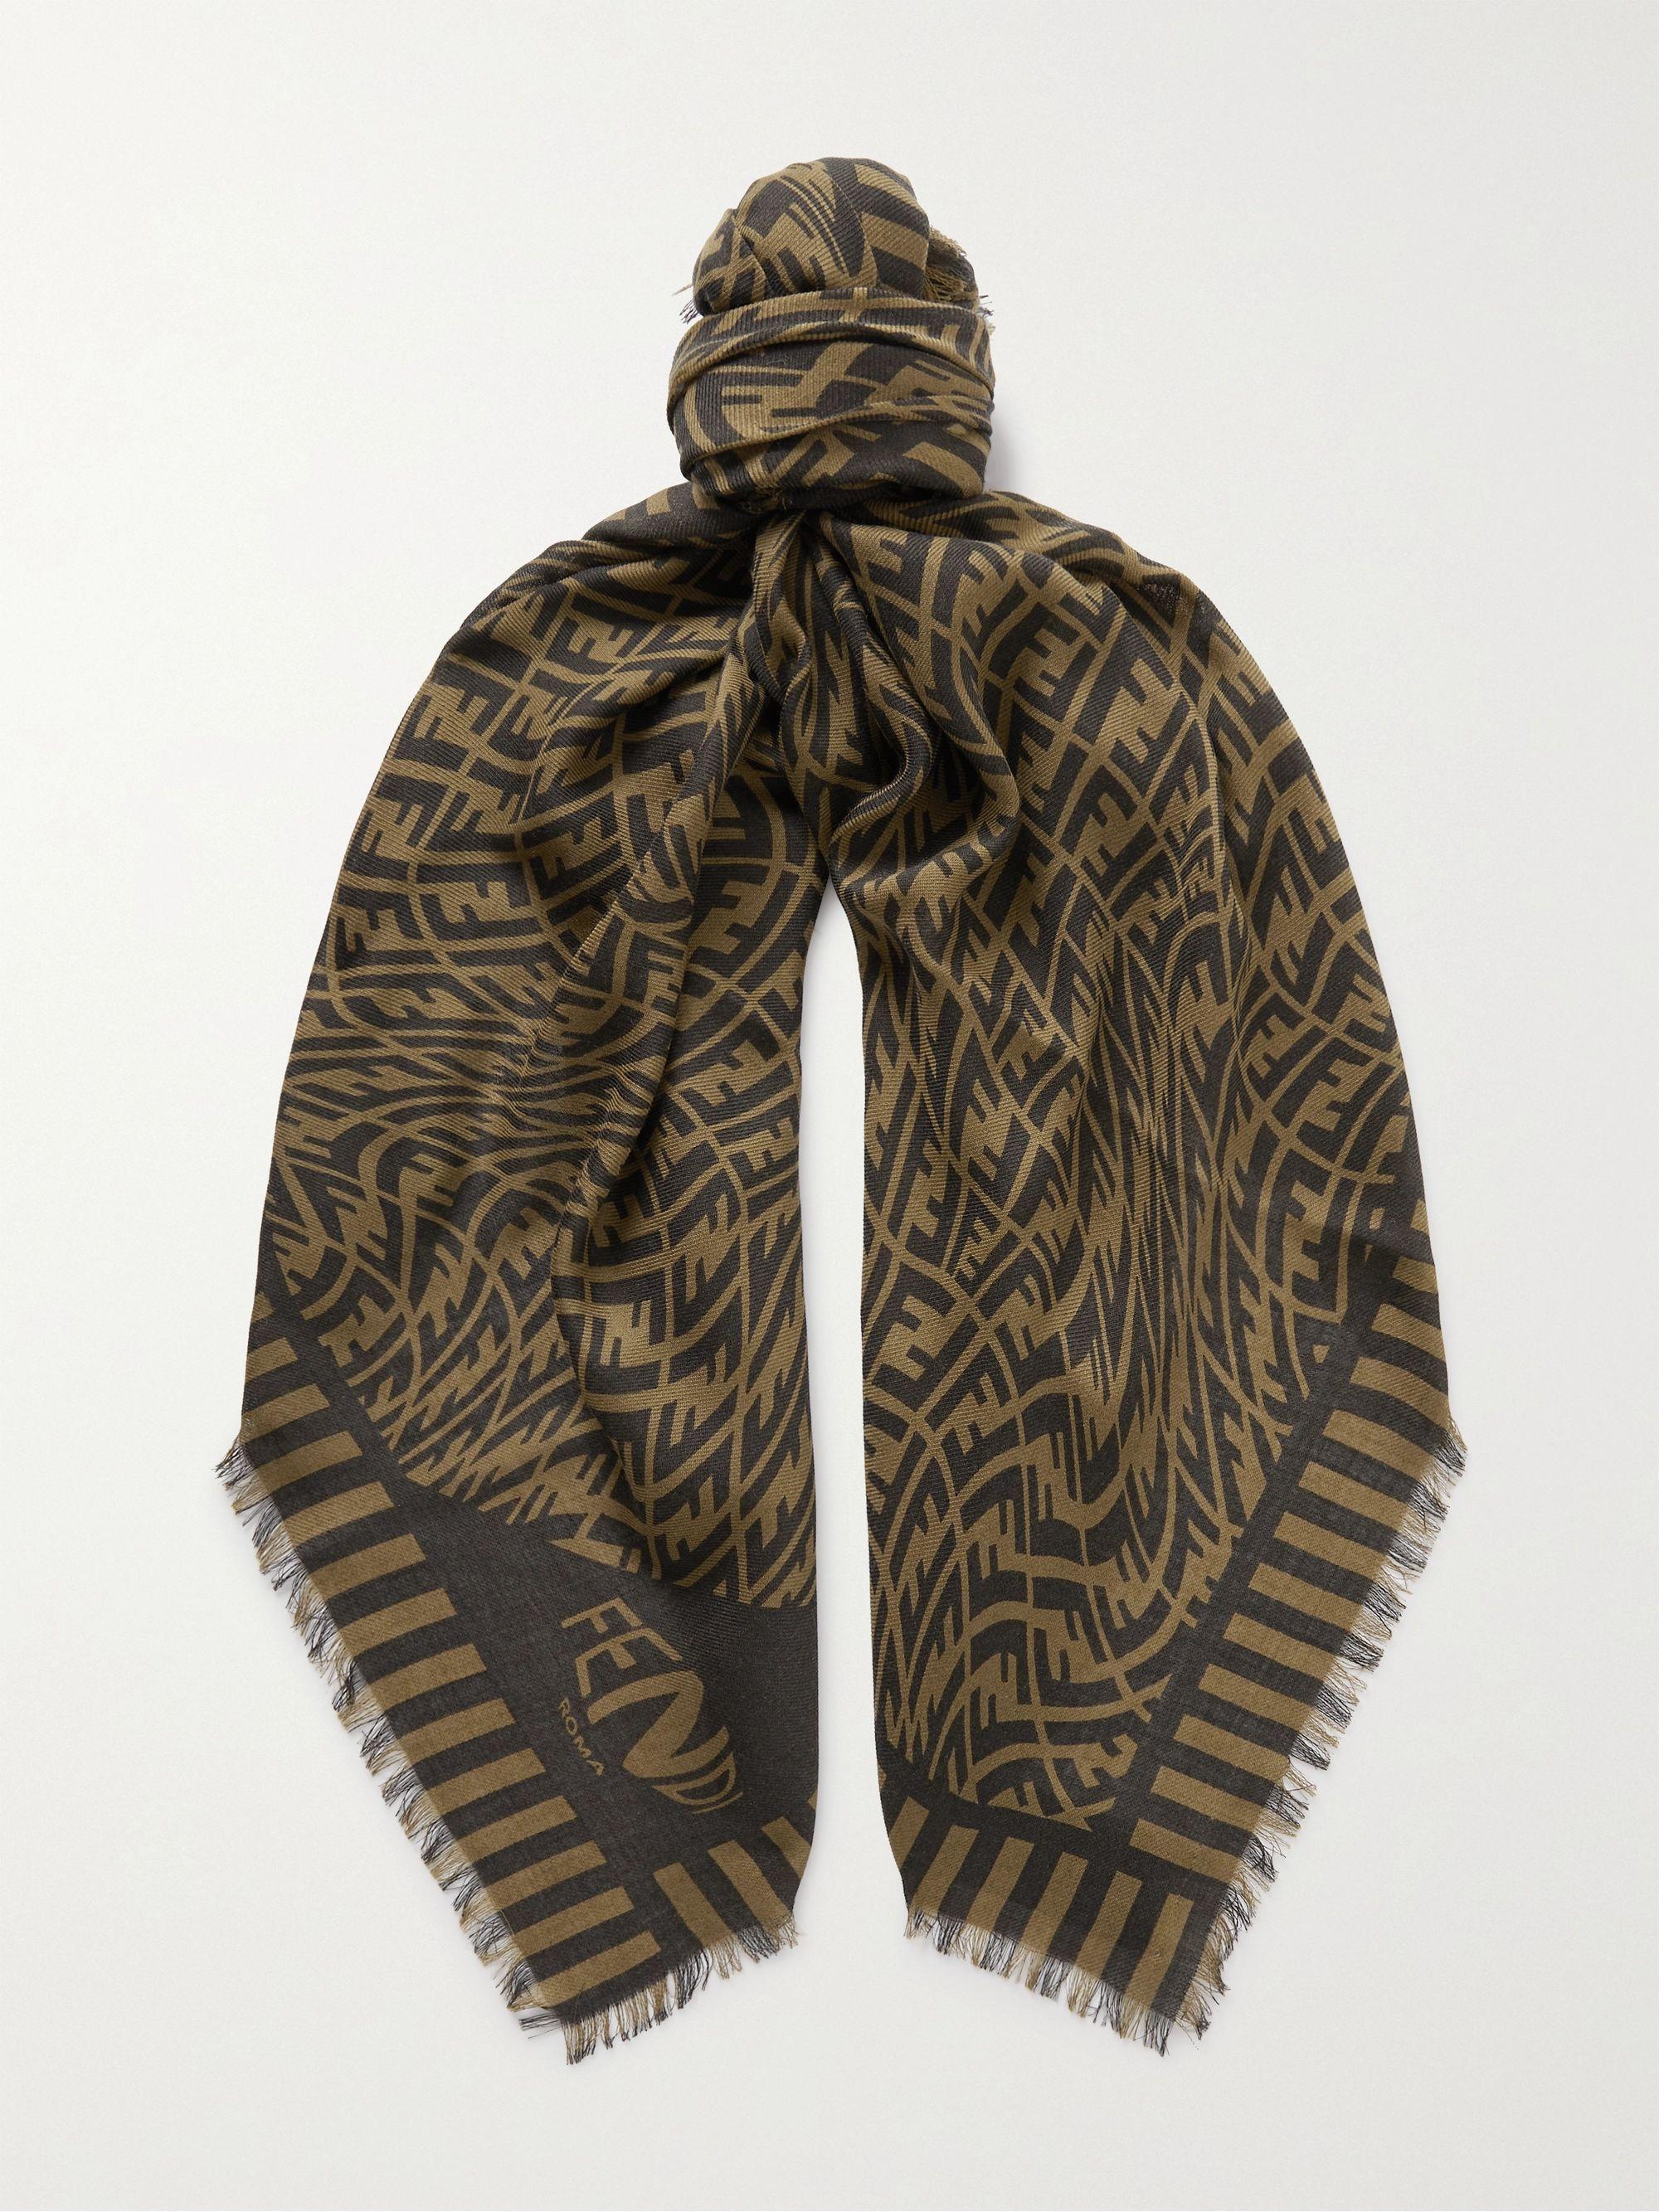 FENDI Logo-Jacquard Wool, Cashmere and Silk-Blend Scarf